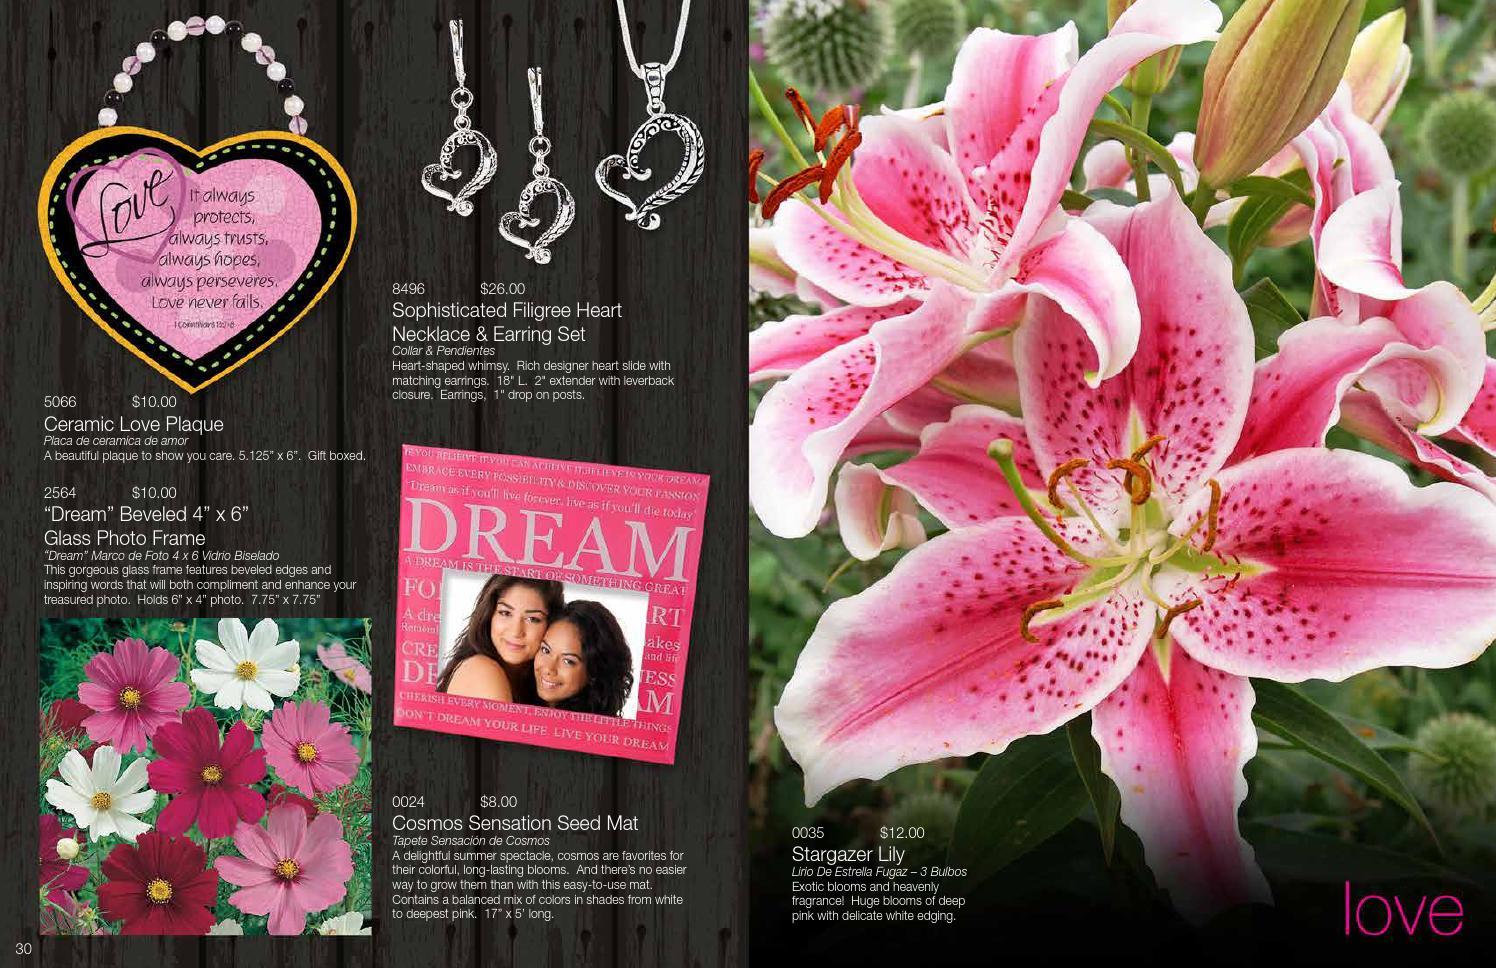 Springtime sensations 2016 122215 by Outlook Magazine - issuu